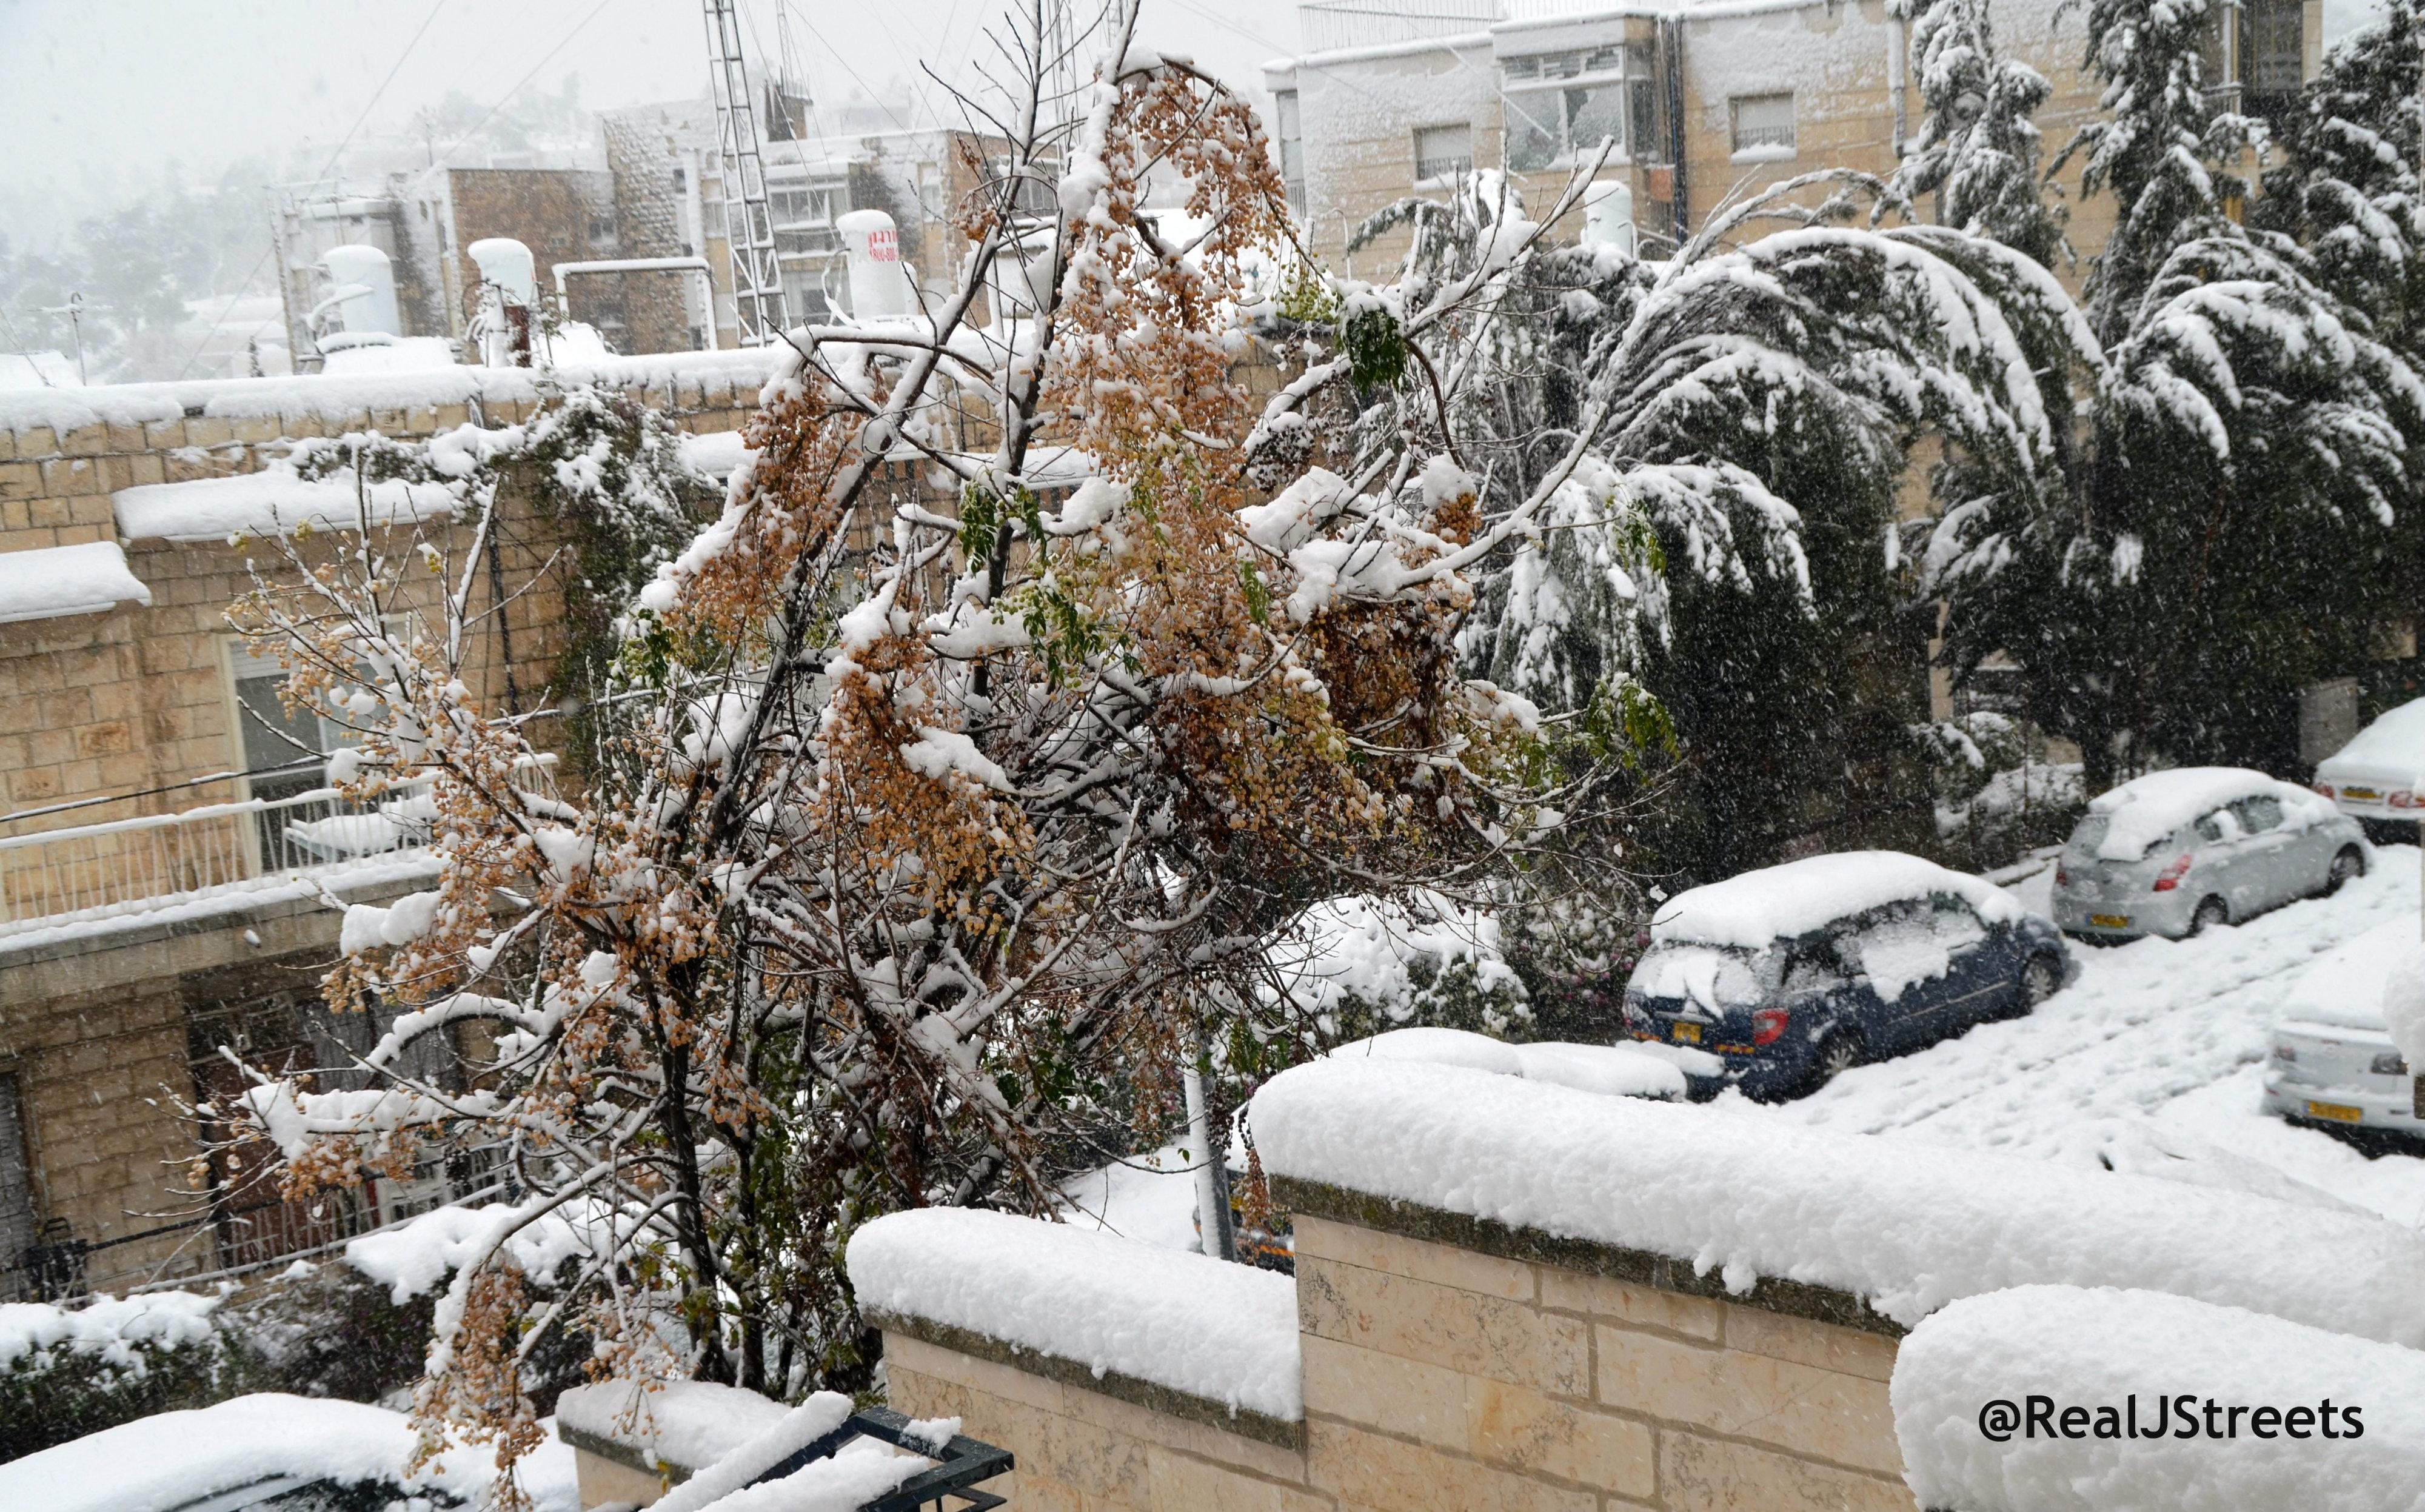 image Jerusalem snow, picture snow Jerusalem